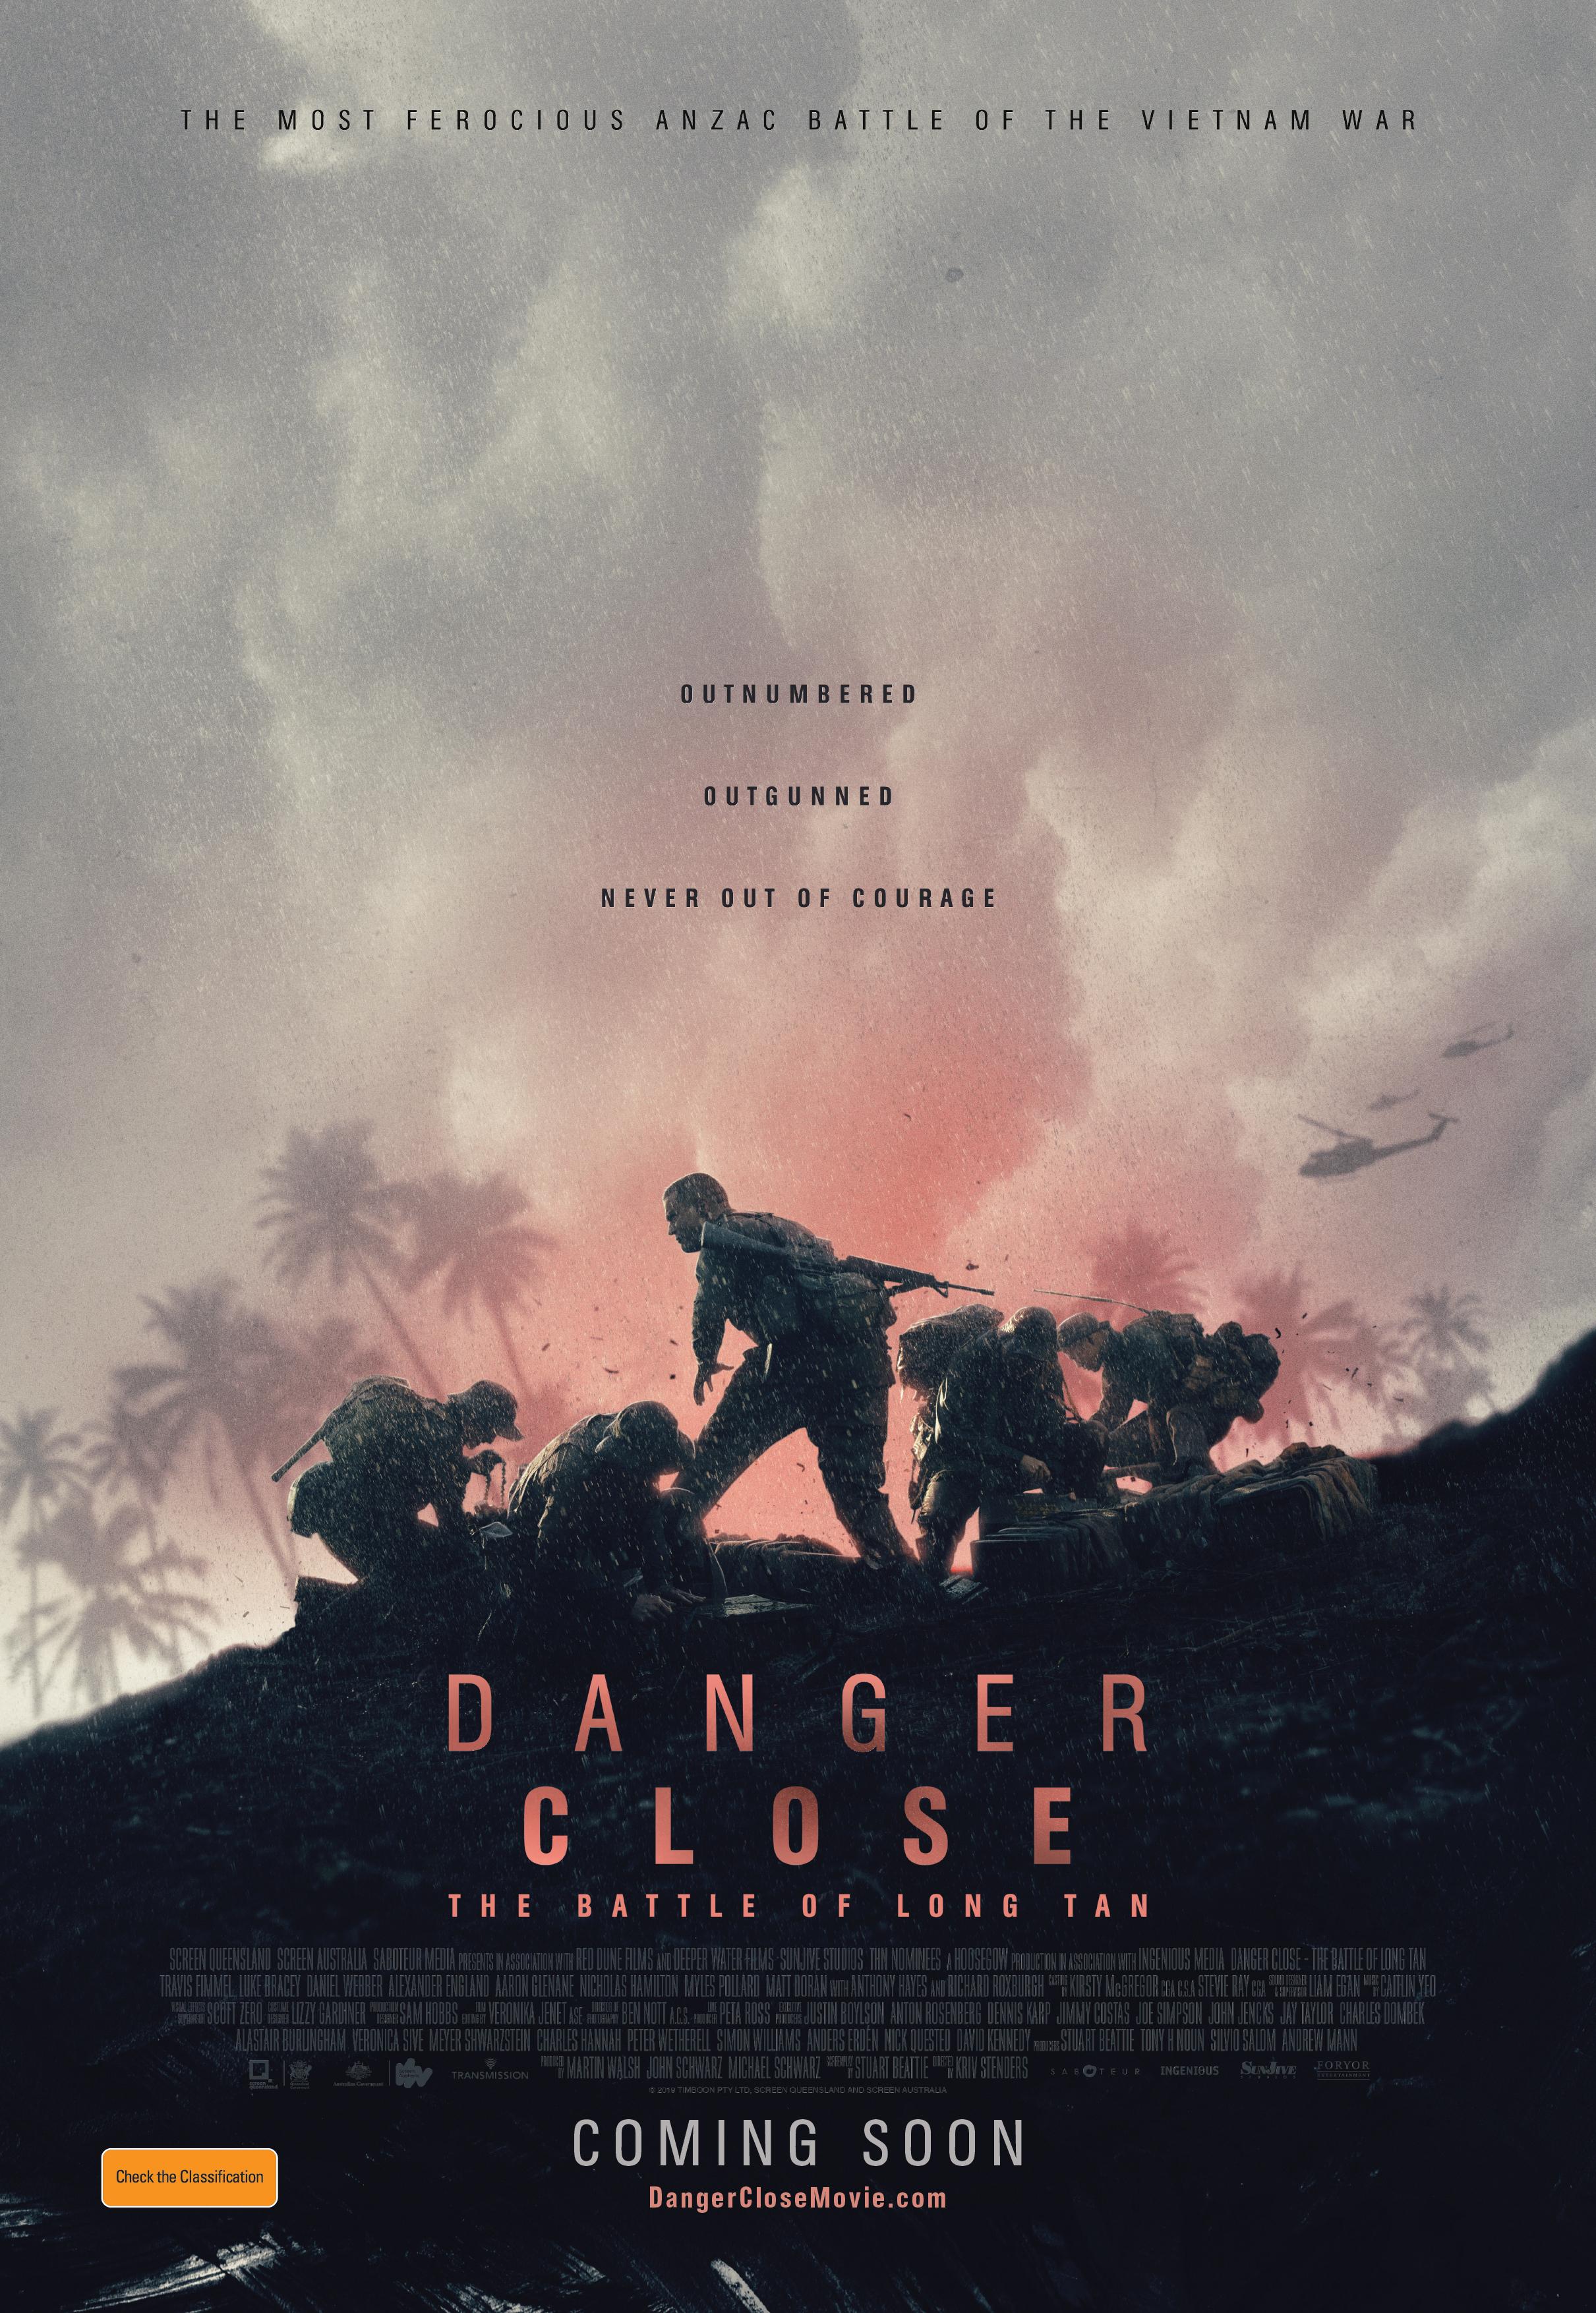 DANGER CLOSE: The Battle of Long Tan Movie - Red Dune Films